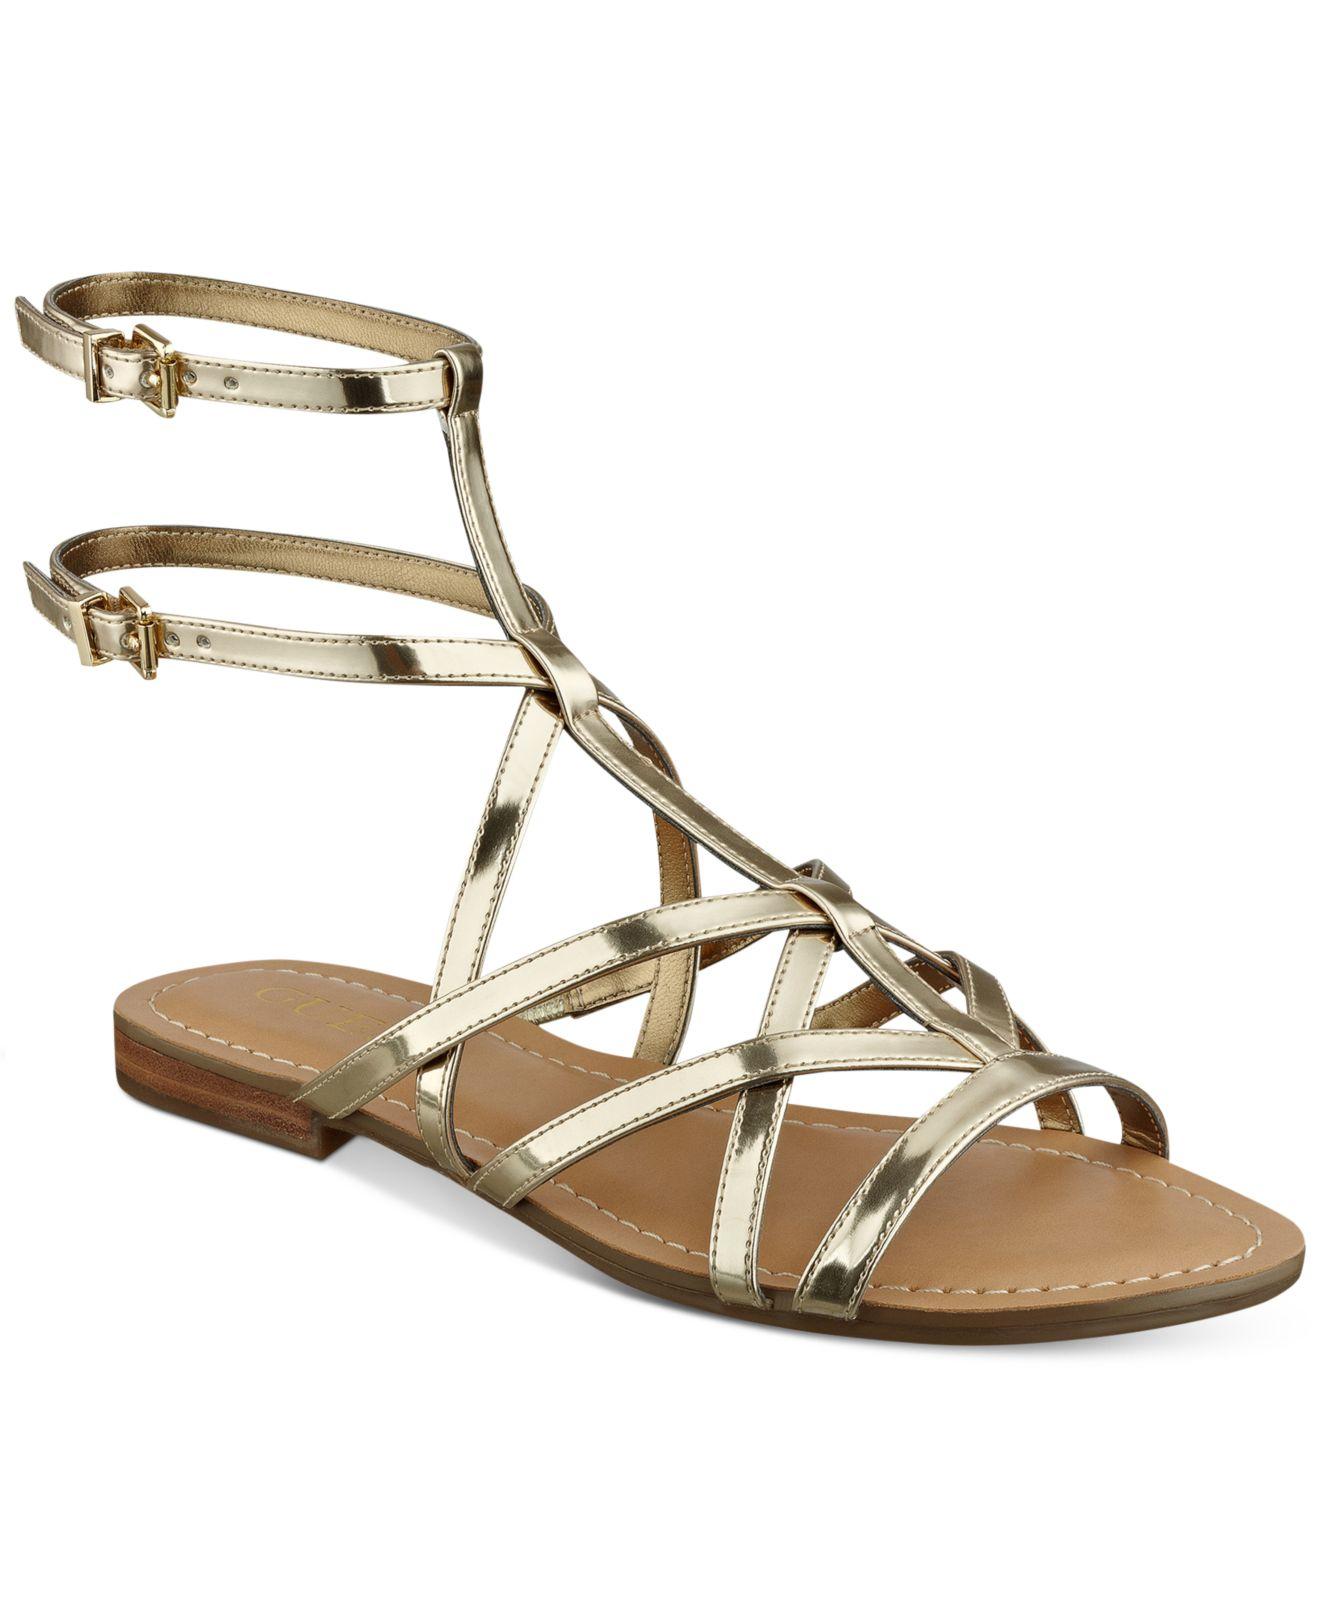 Guess Women S Mannie Strappy Flat Sandals In Metallic Lyst